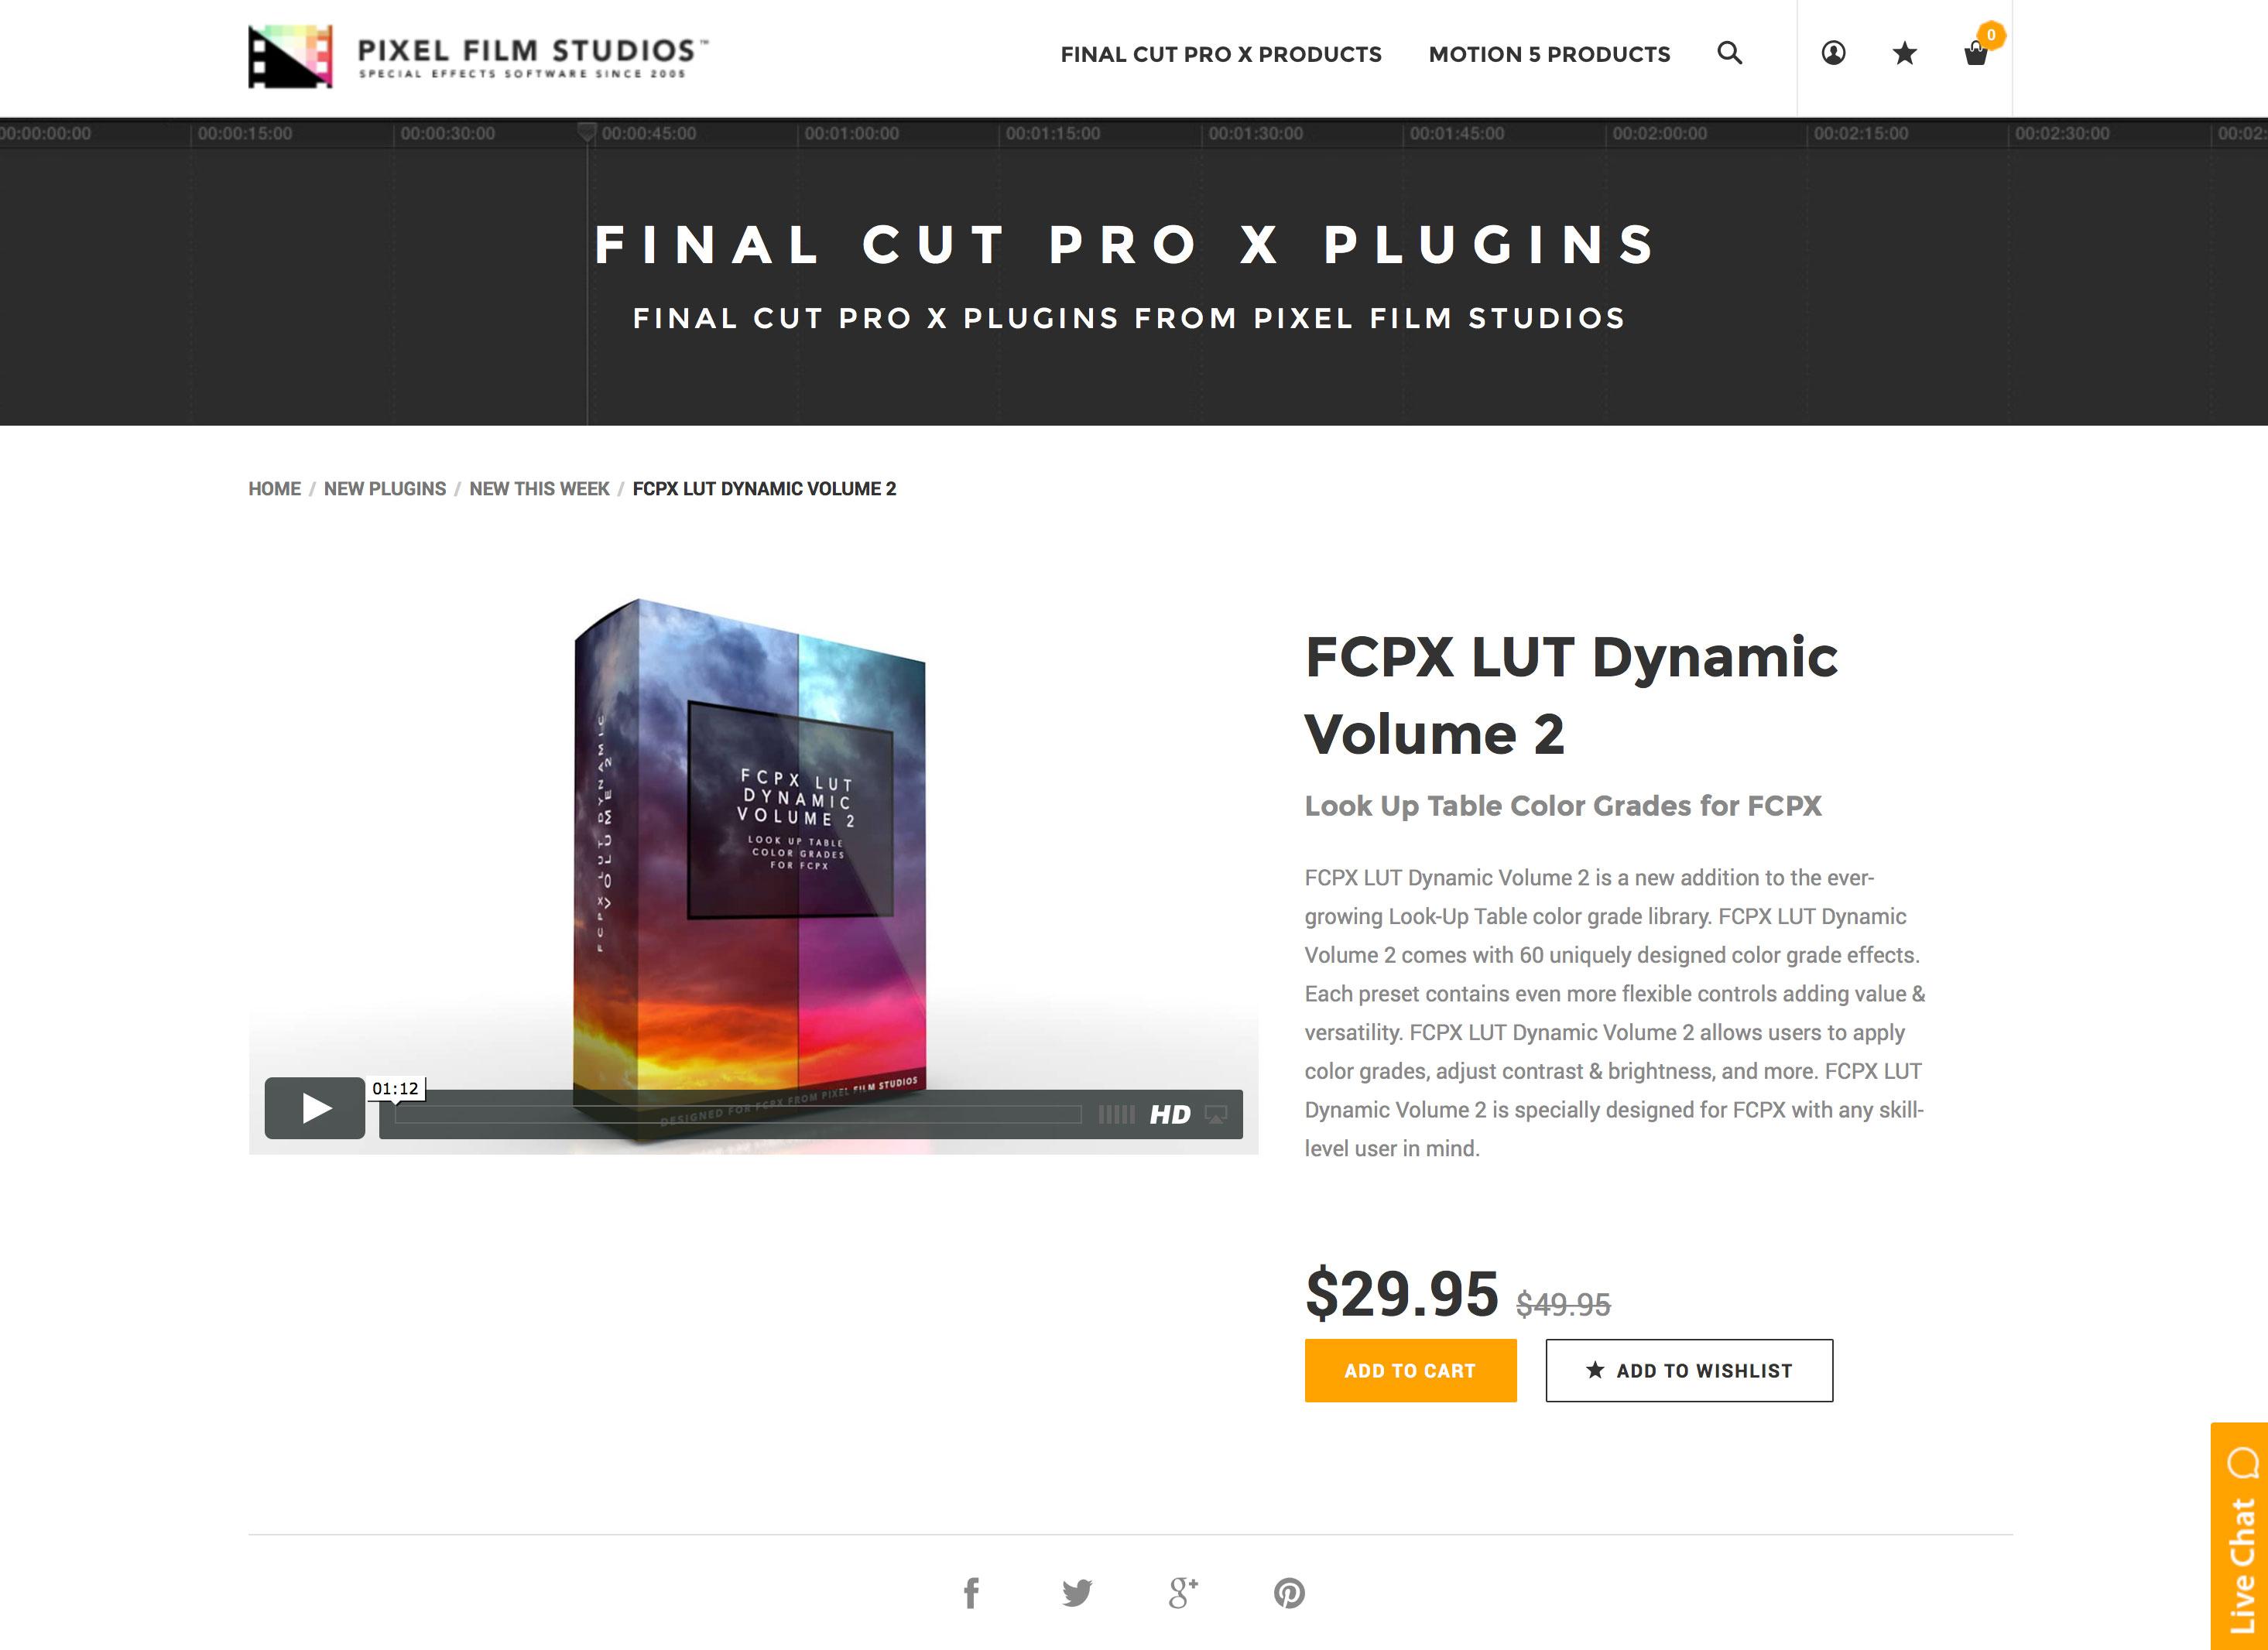 Pixel Film Studios Production Team Released FCPX LUT Dynamic